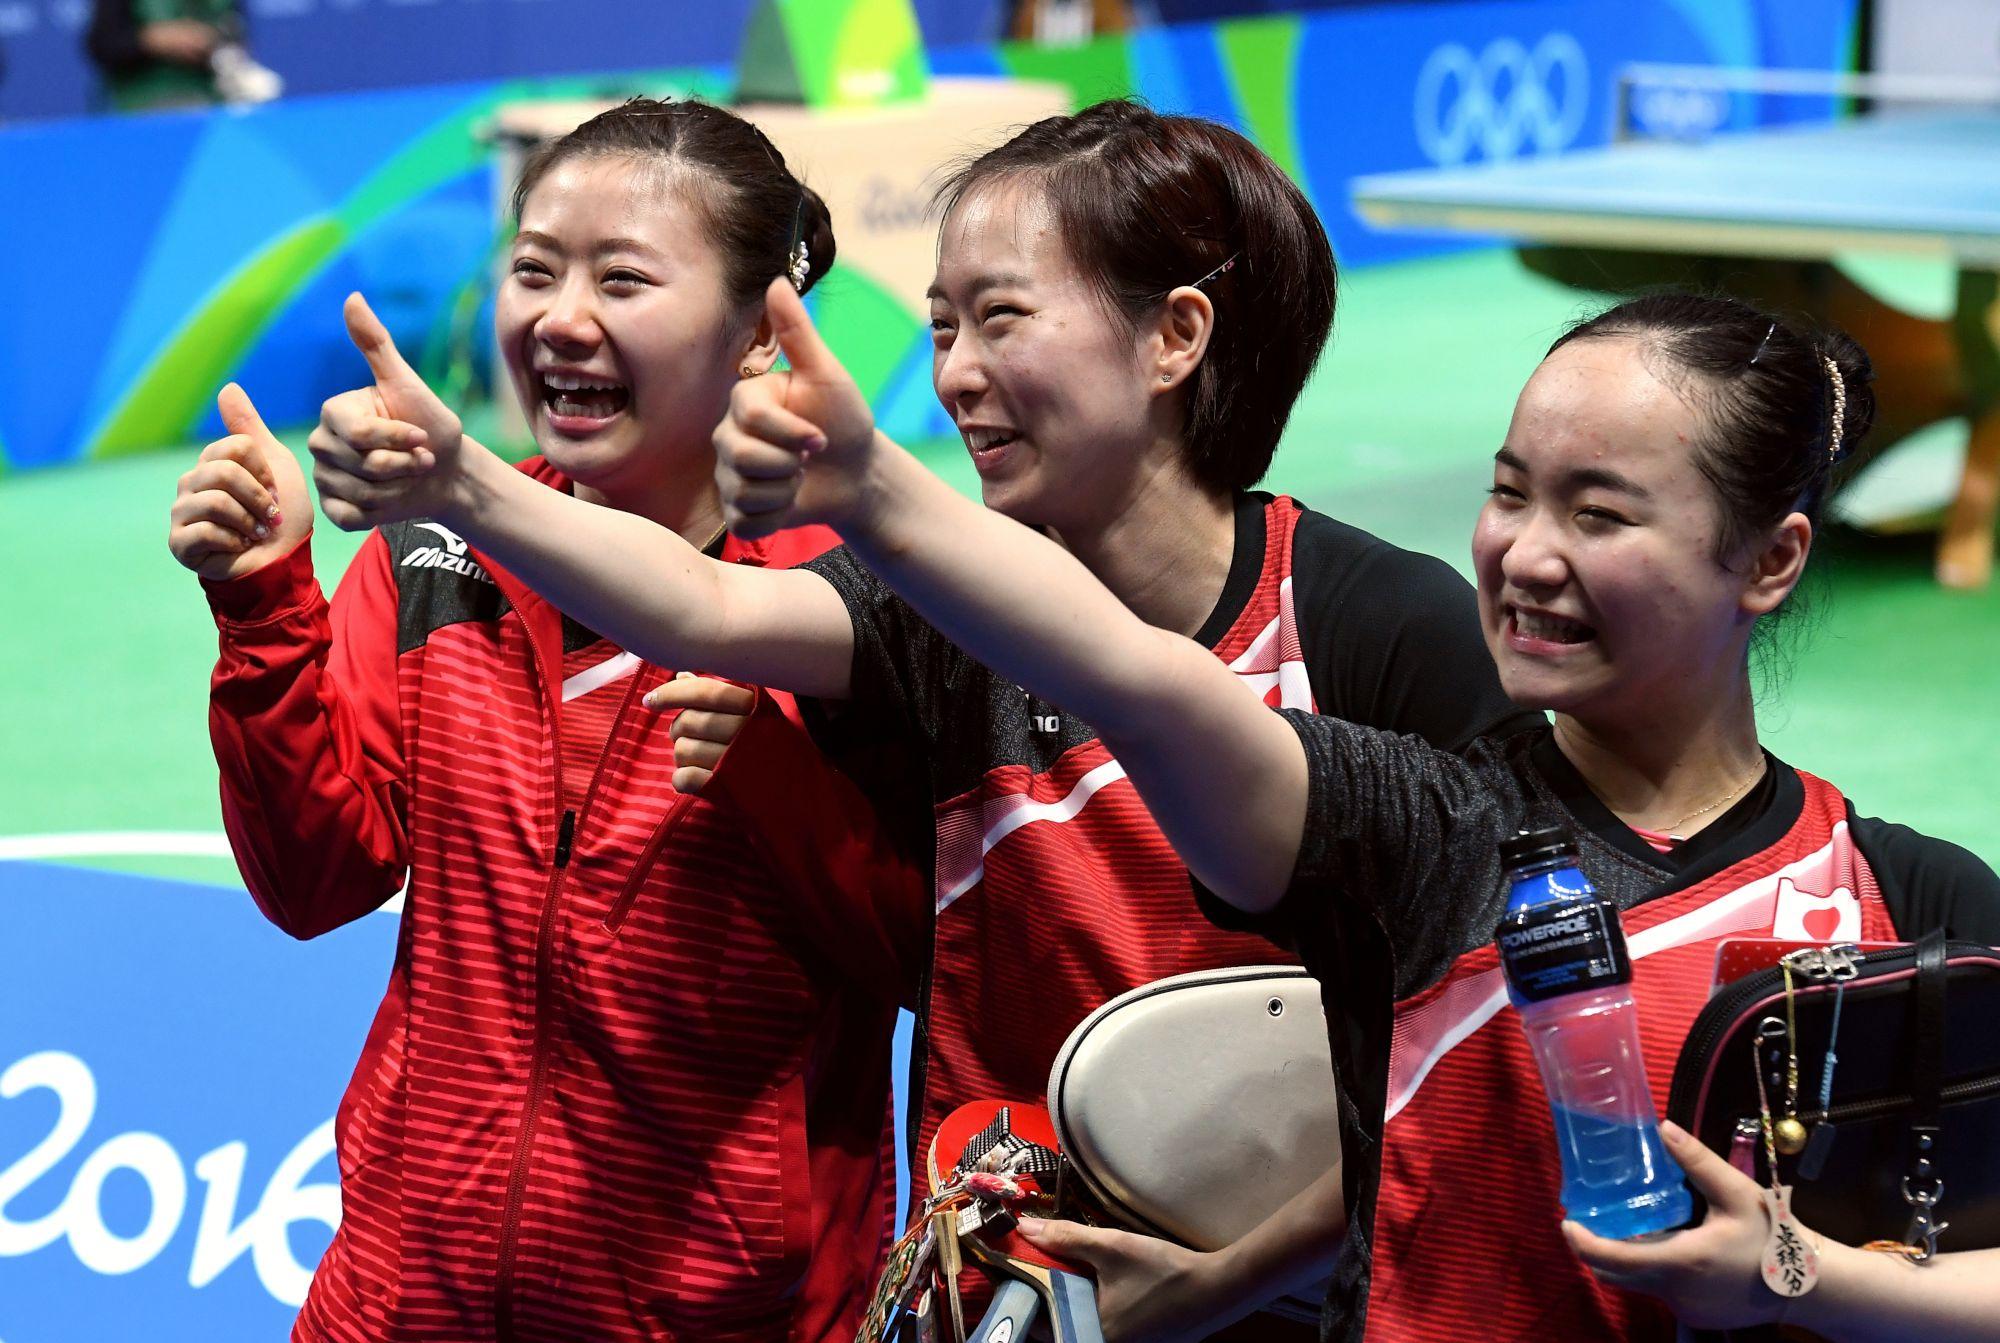 卓球女子団体、団結の銅